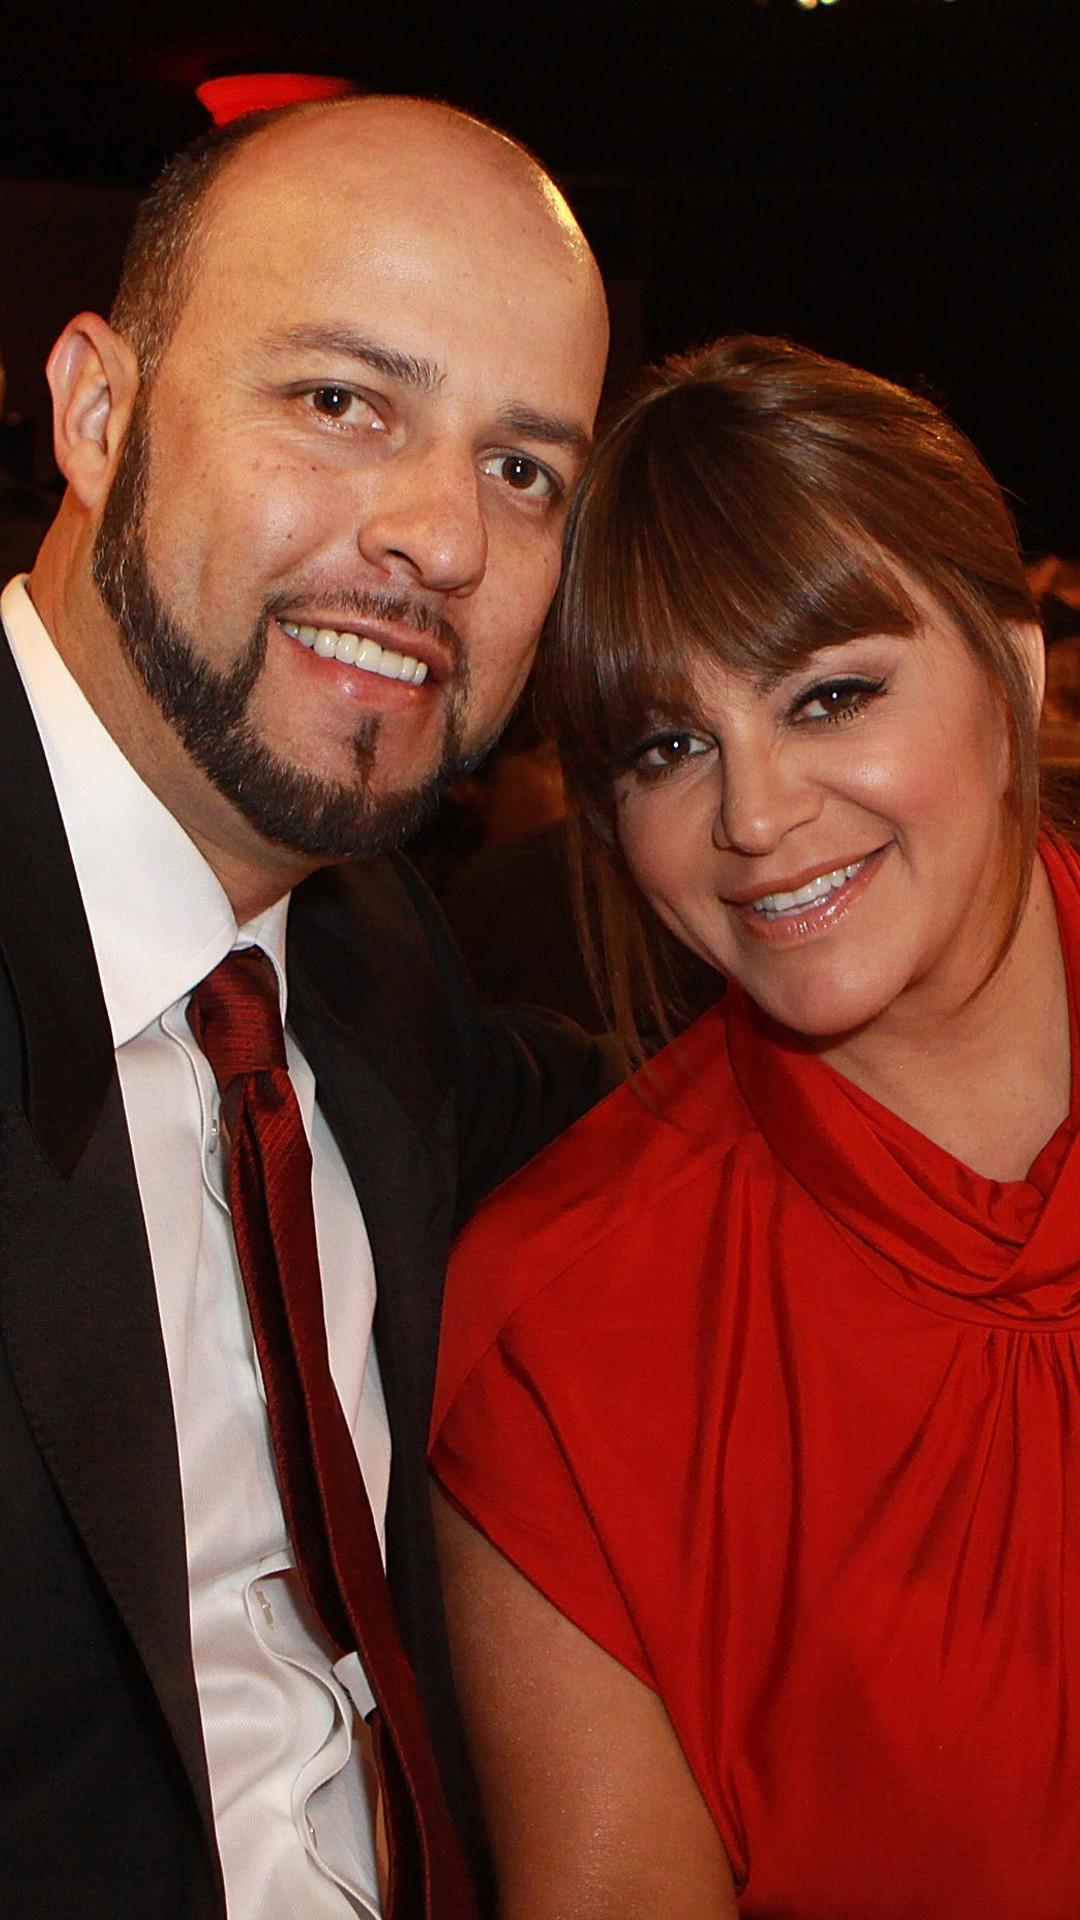 Jenni Riveras Husband Esteban Loaiza Arrested For Possessing 500k